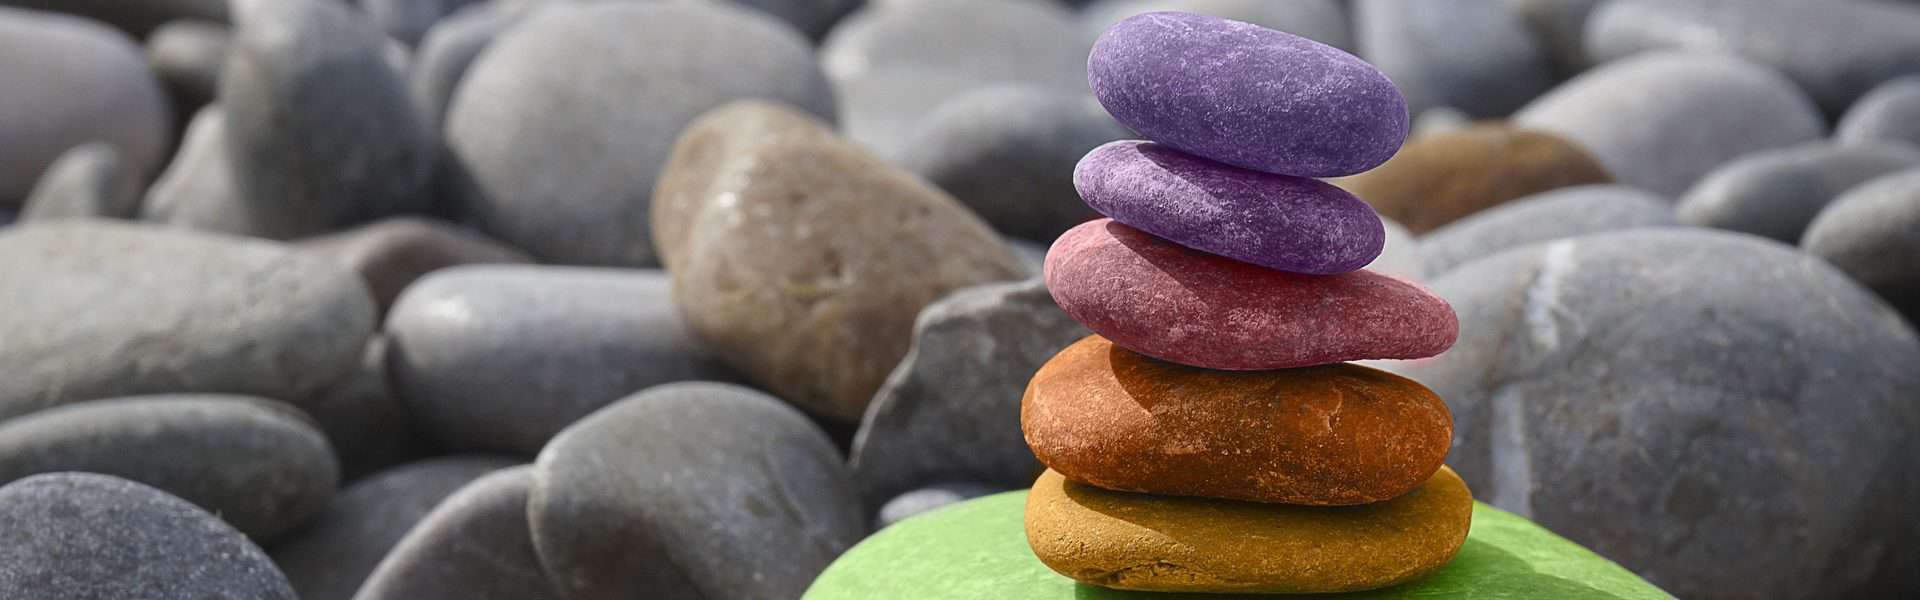 colorful rocks balancing